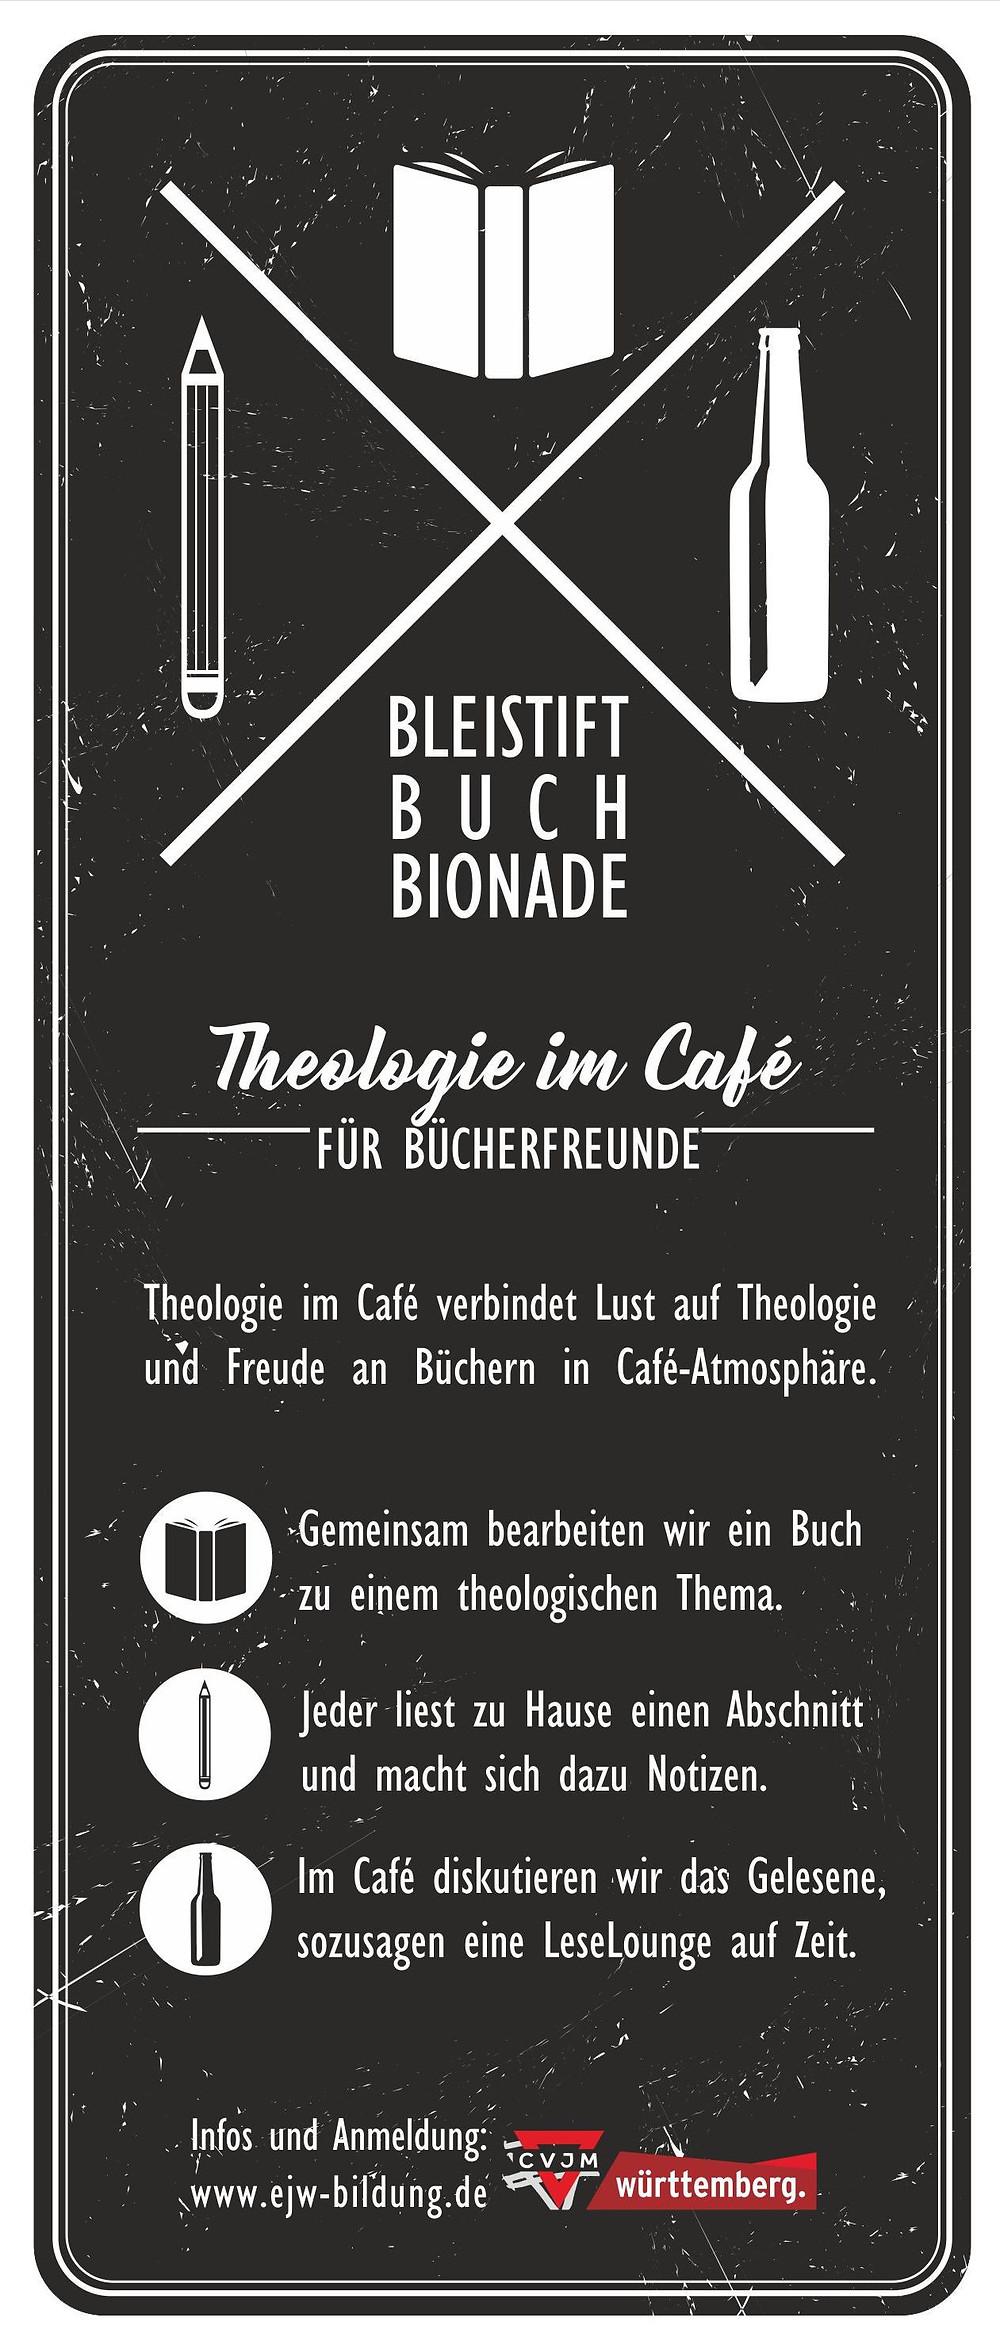 Theologie im Café CVJM N.T. Wright